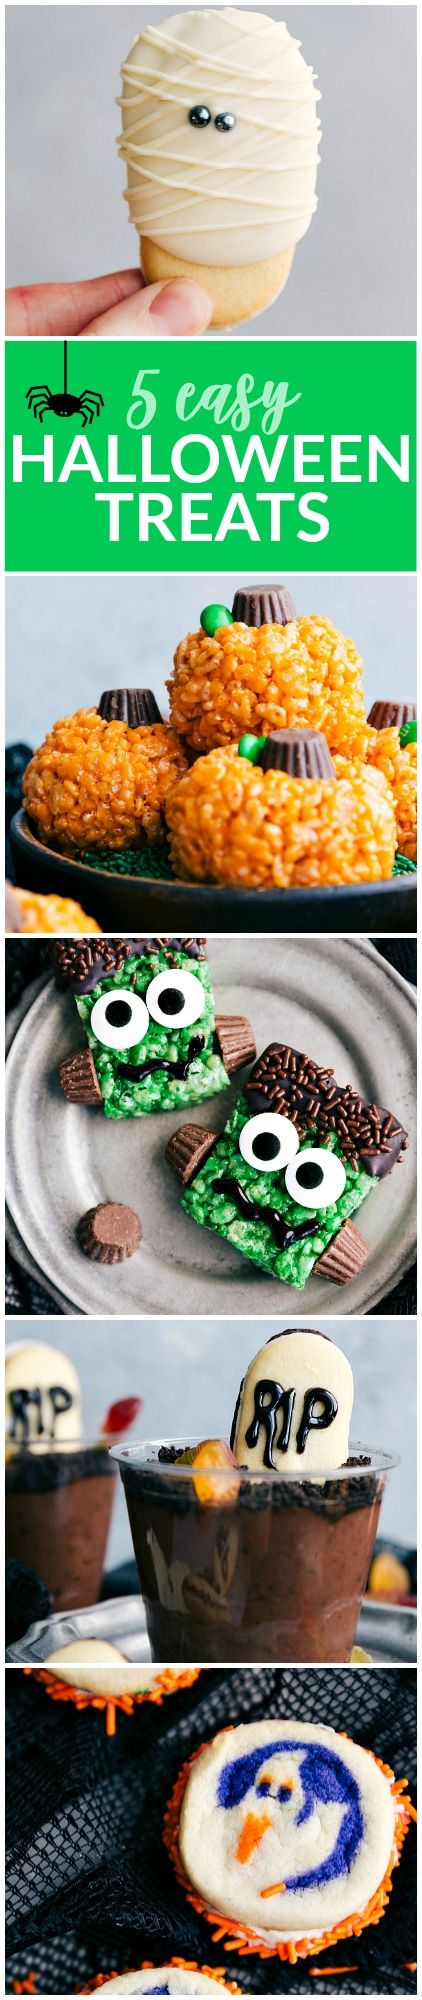 5 super easy Halloween treats -- mummy cookies, graveyard pudding cups, Frankenstein kripsies, pumpkin krispies, and double-sided Halloween sandwich cookies via chelseasmessyapron.com